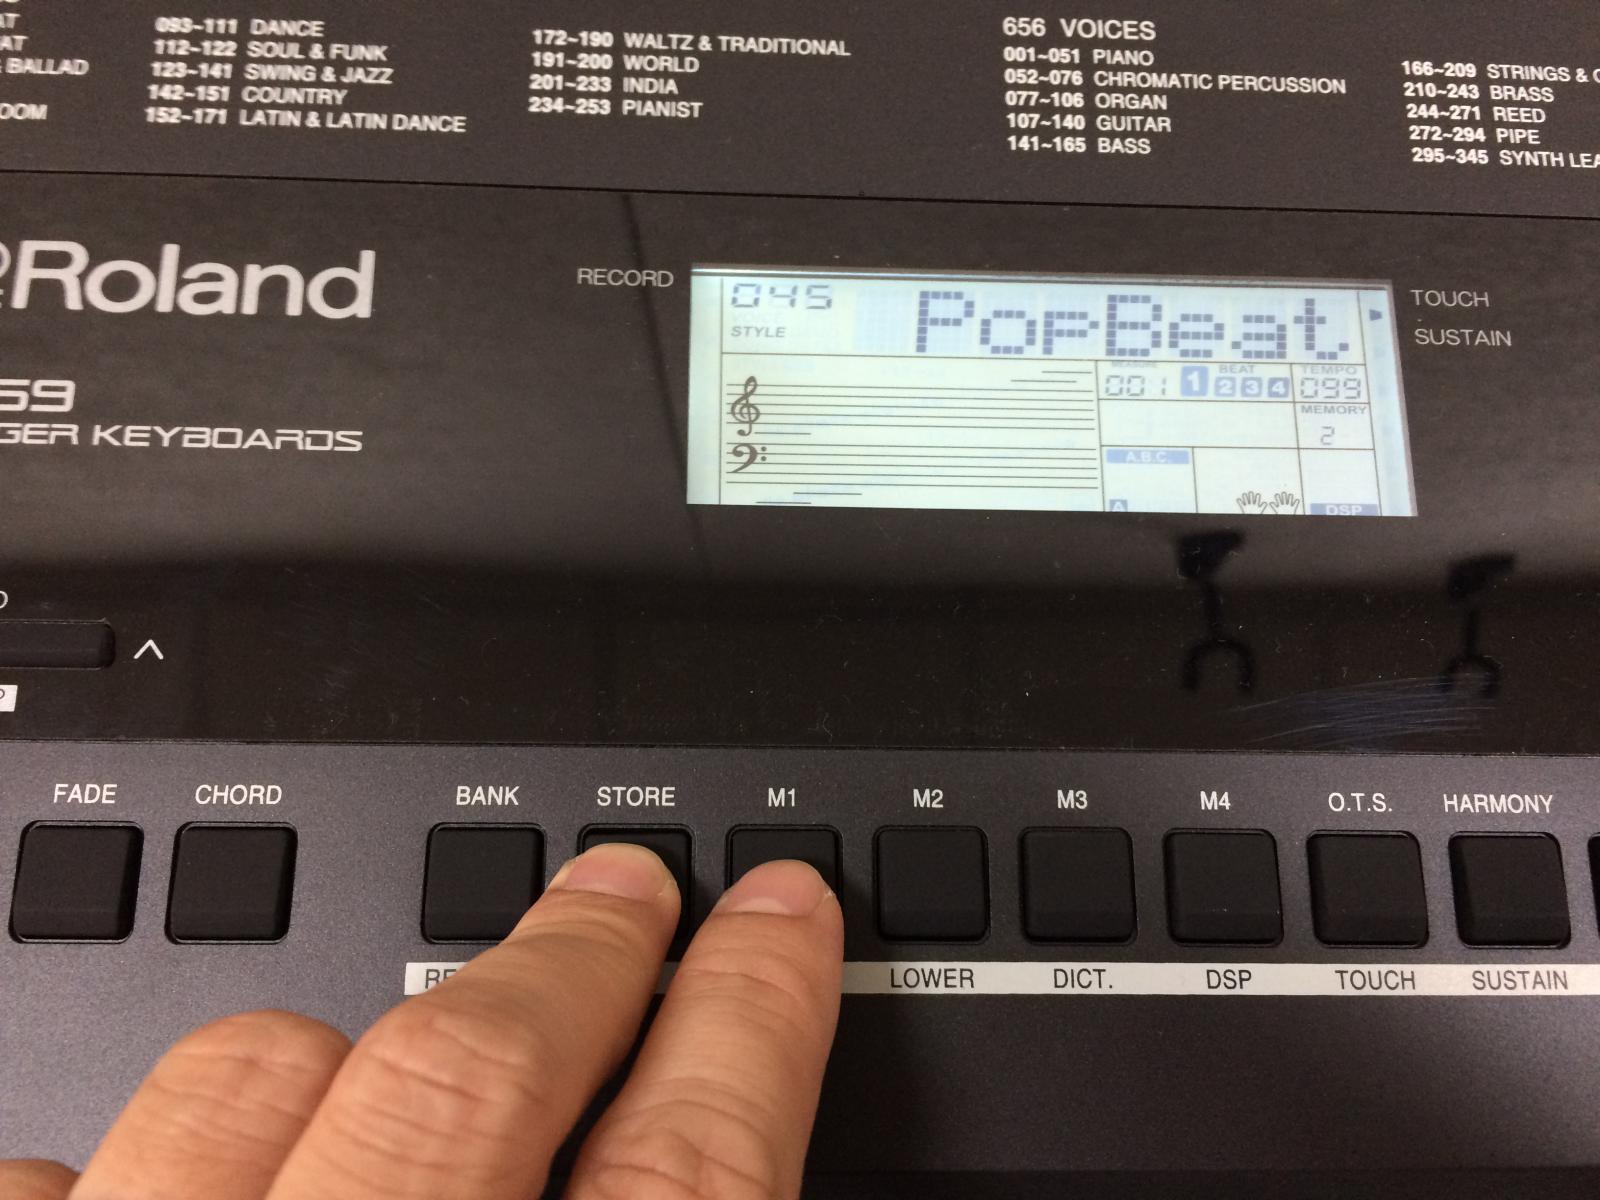 đàn keyboard roland e-x20